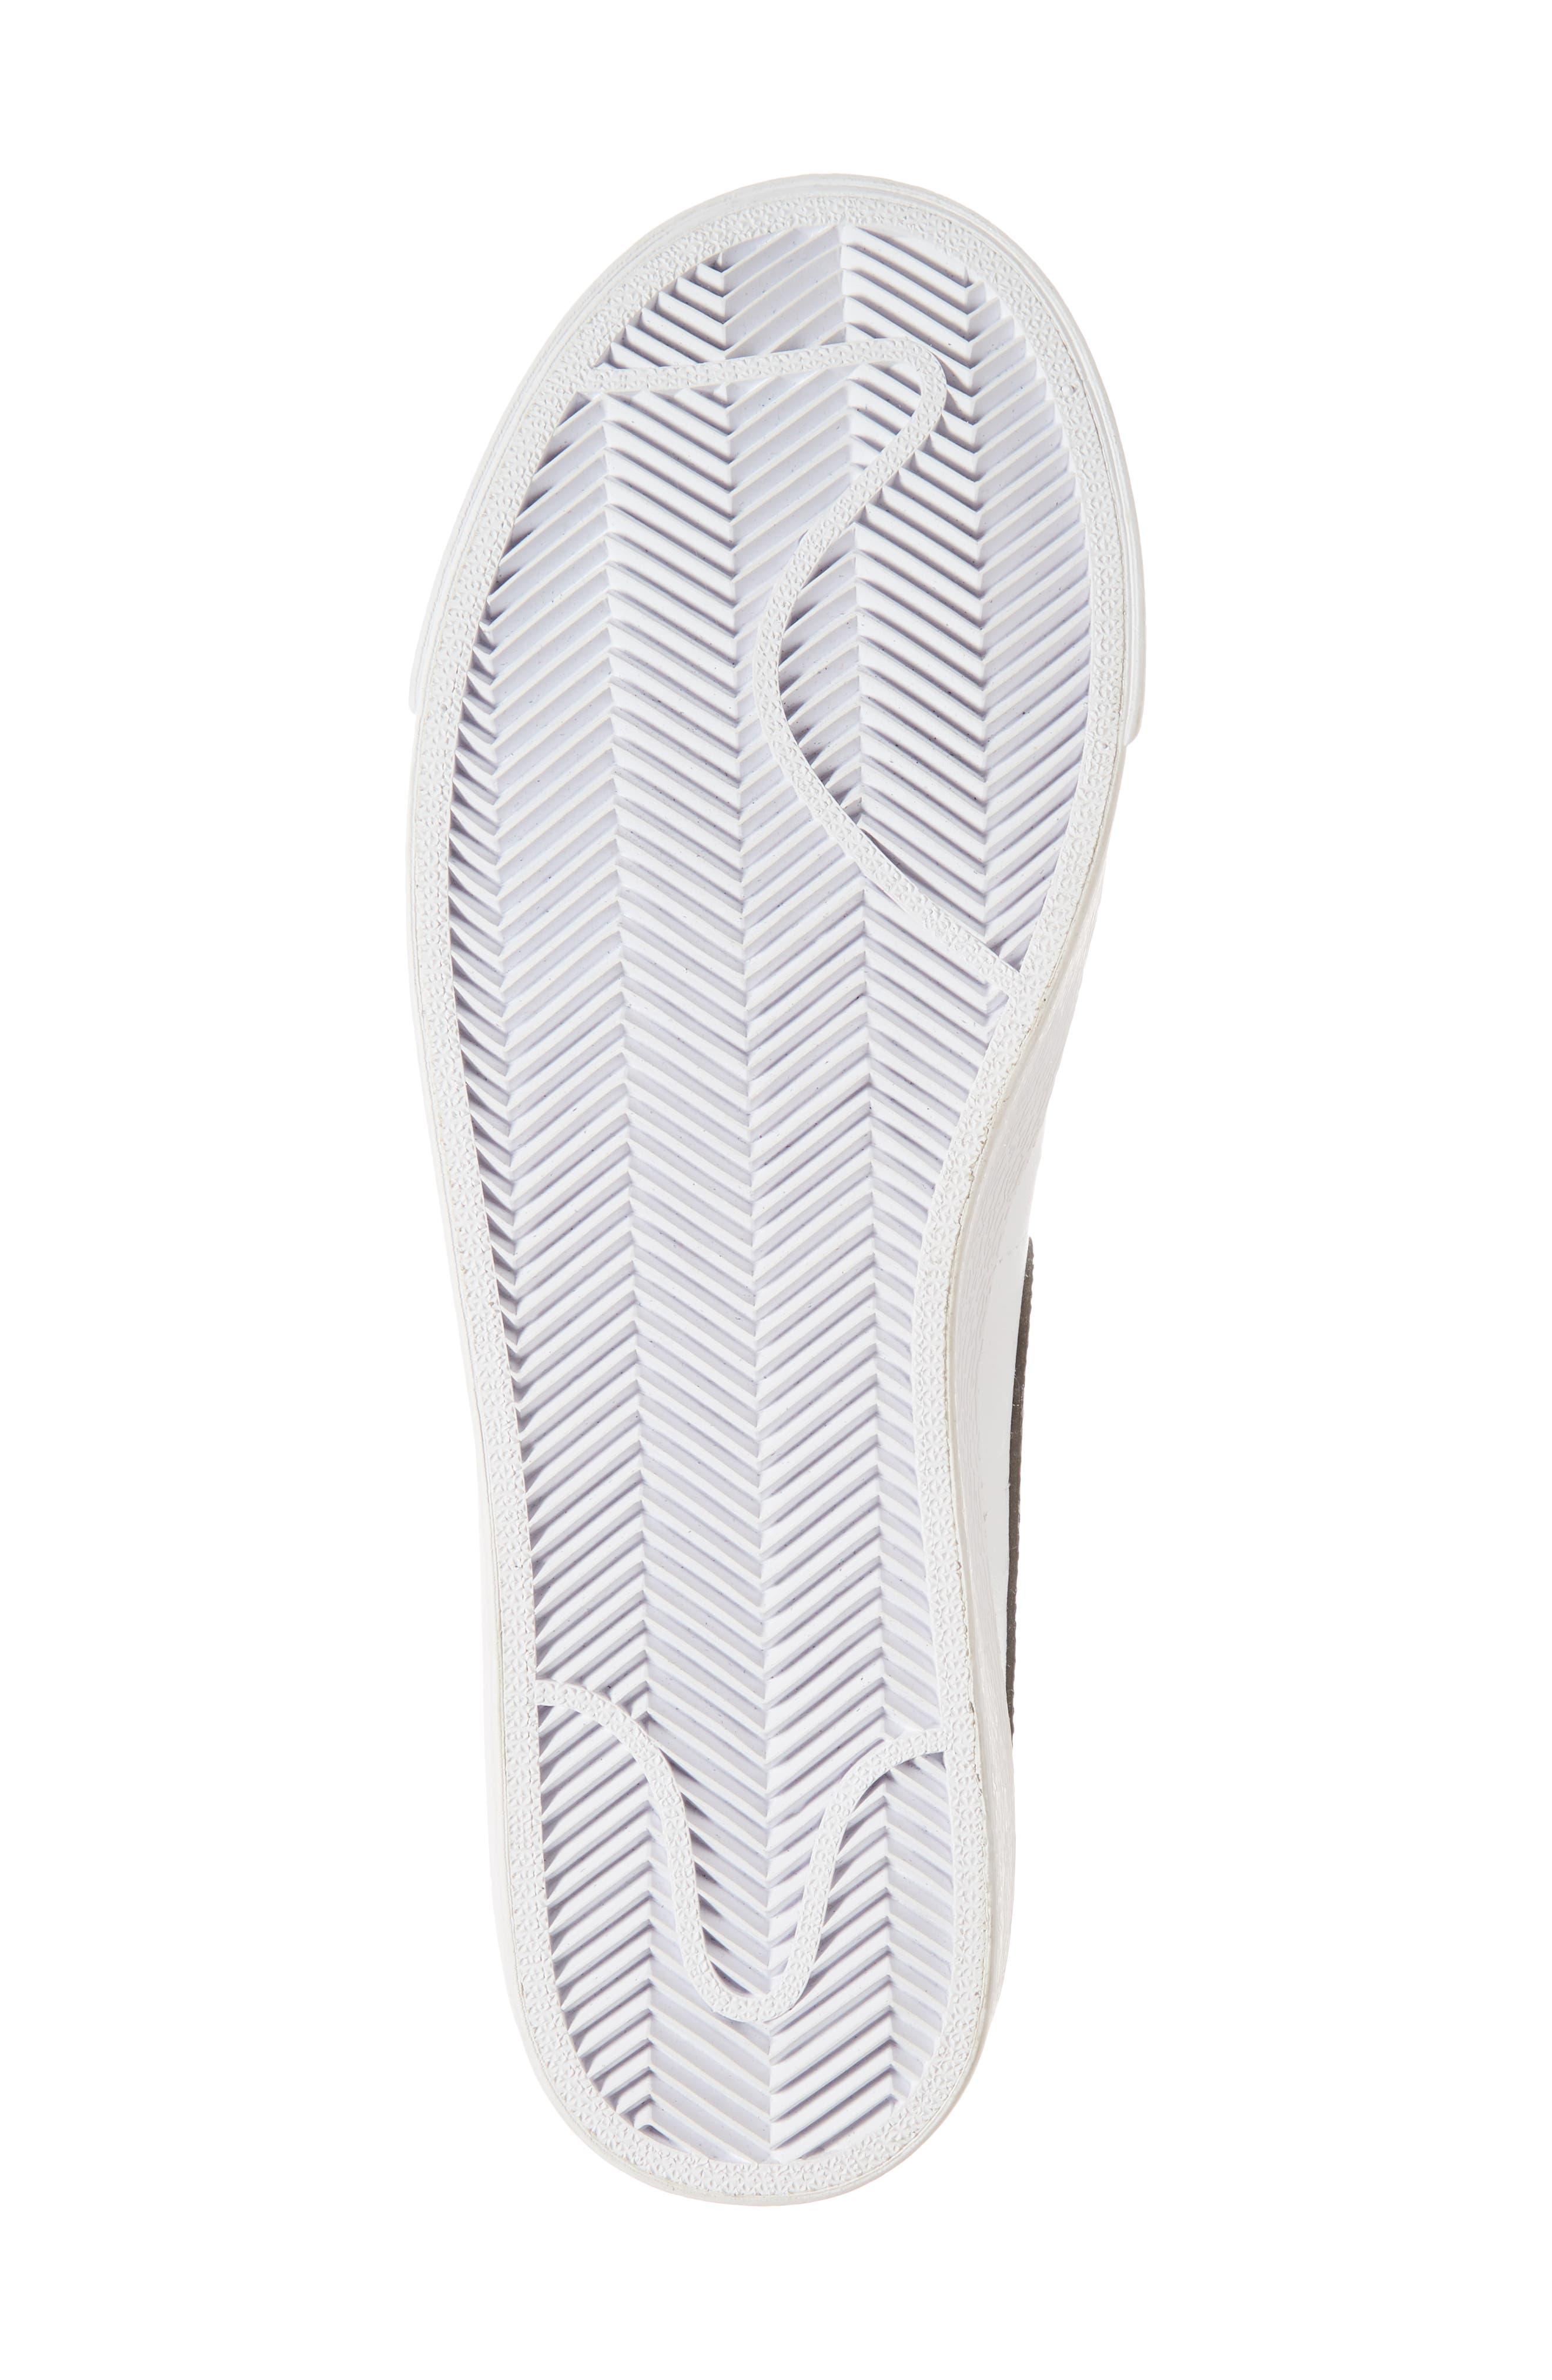 Blazer Low Essential Sneaker,                             Alternate thumbnail 6, color,                             100